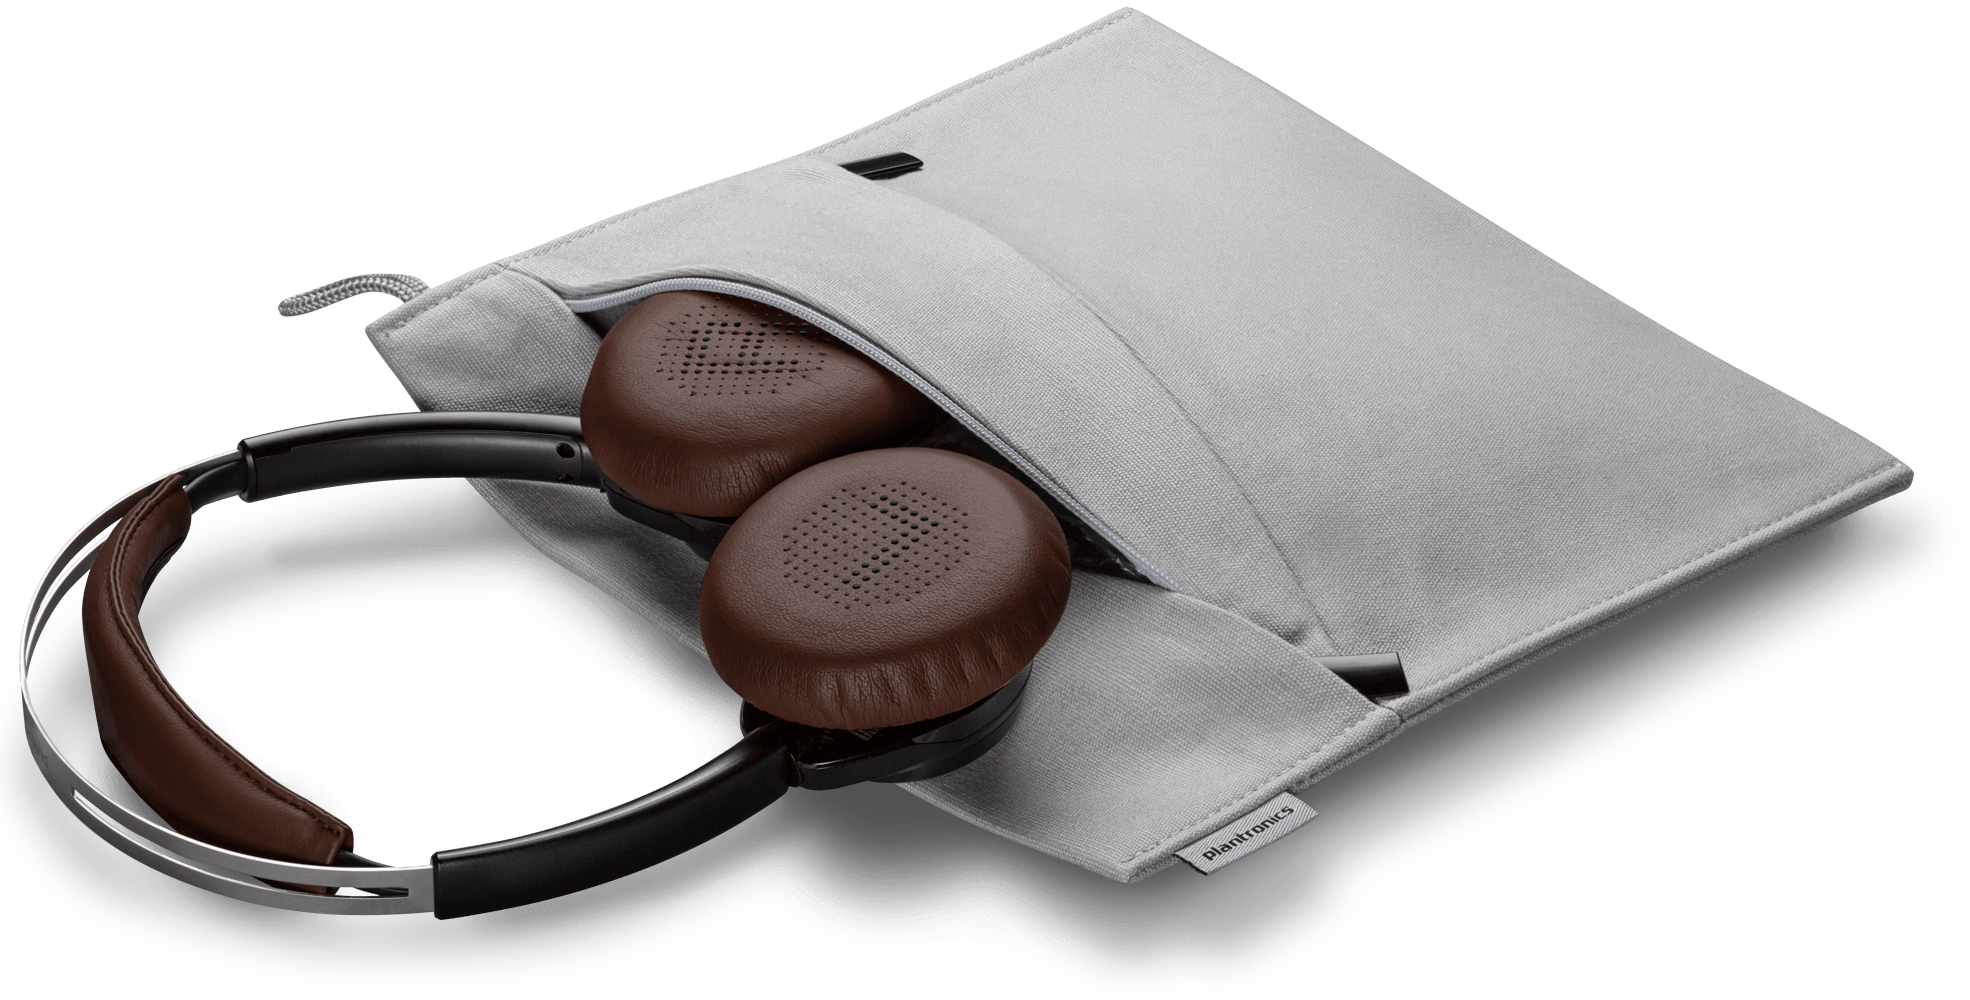 backbeat-sense-black-headset-and-case